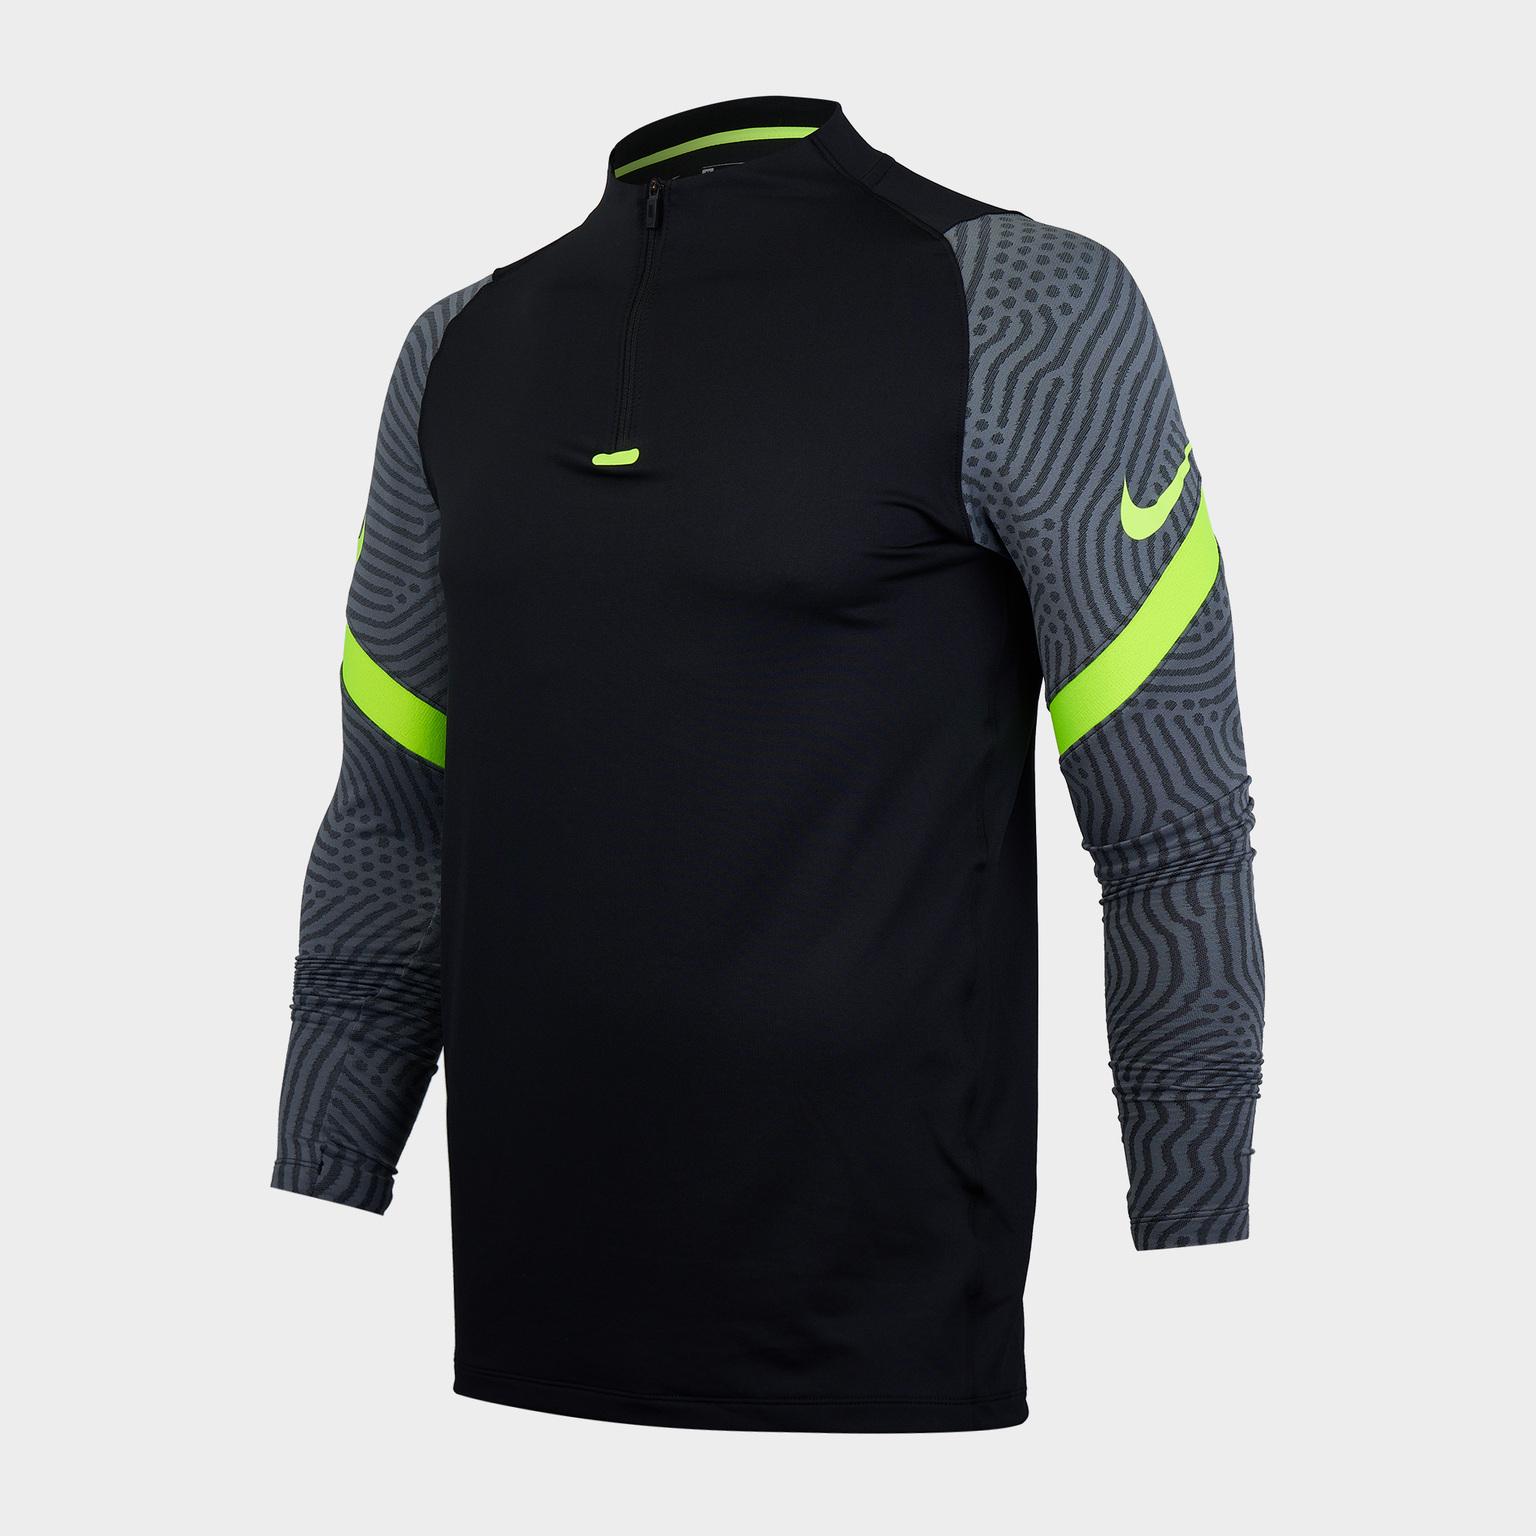 Фото - Свитер тренировочный Nike Dry Strike Dril Top CD0564-011 свитер тренировочный nike dry academy18 dril top ls 893624 451